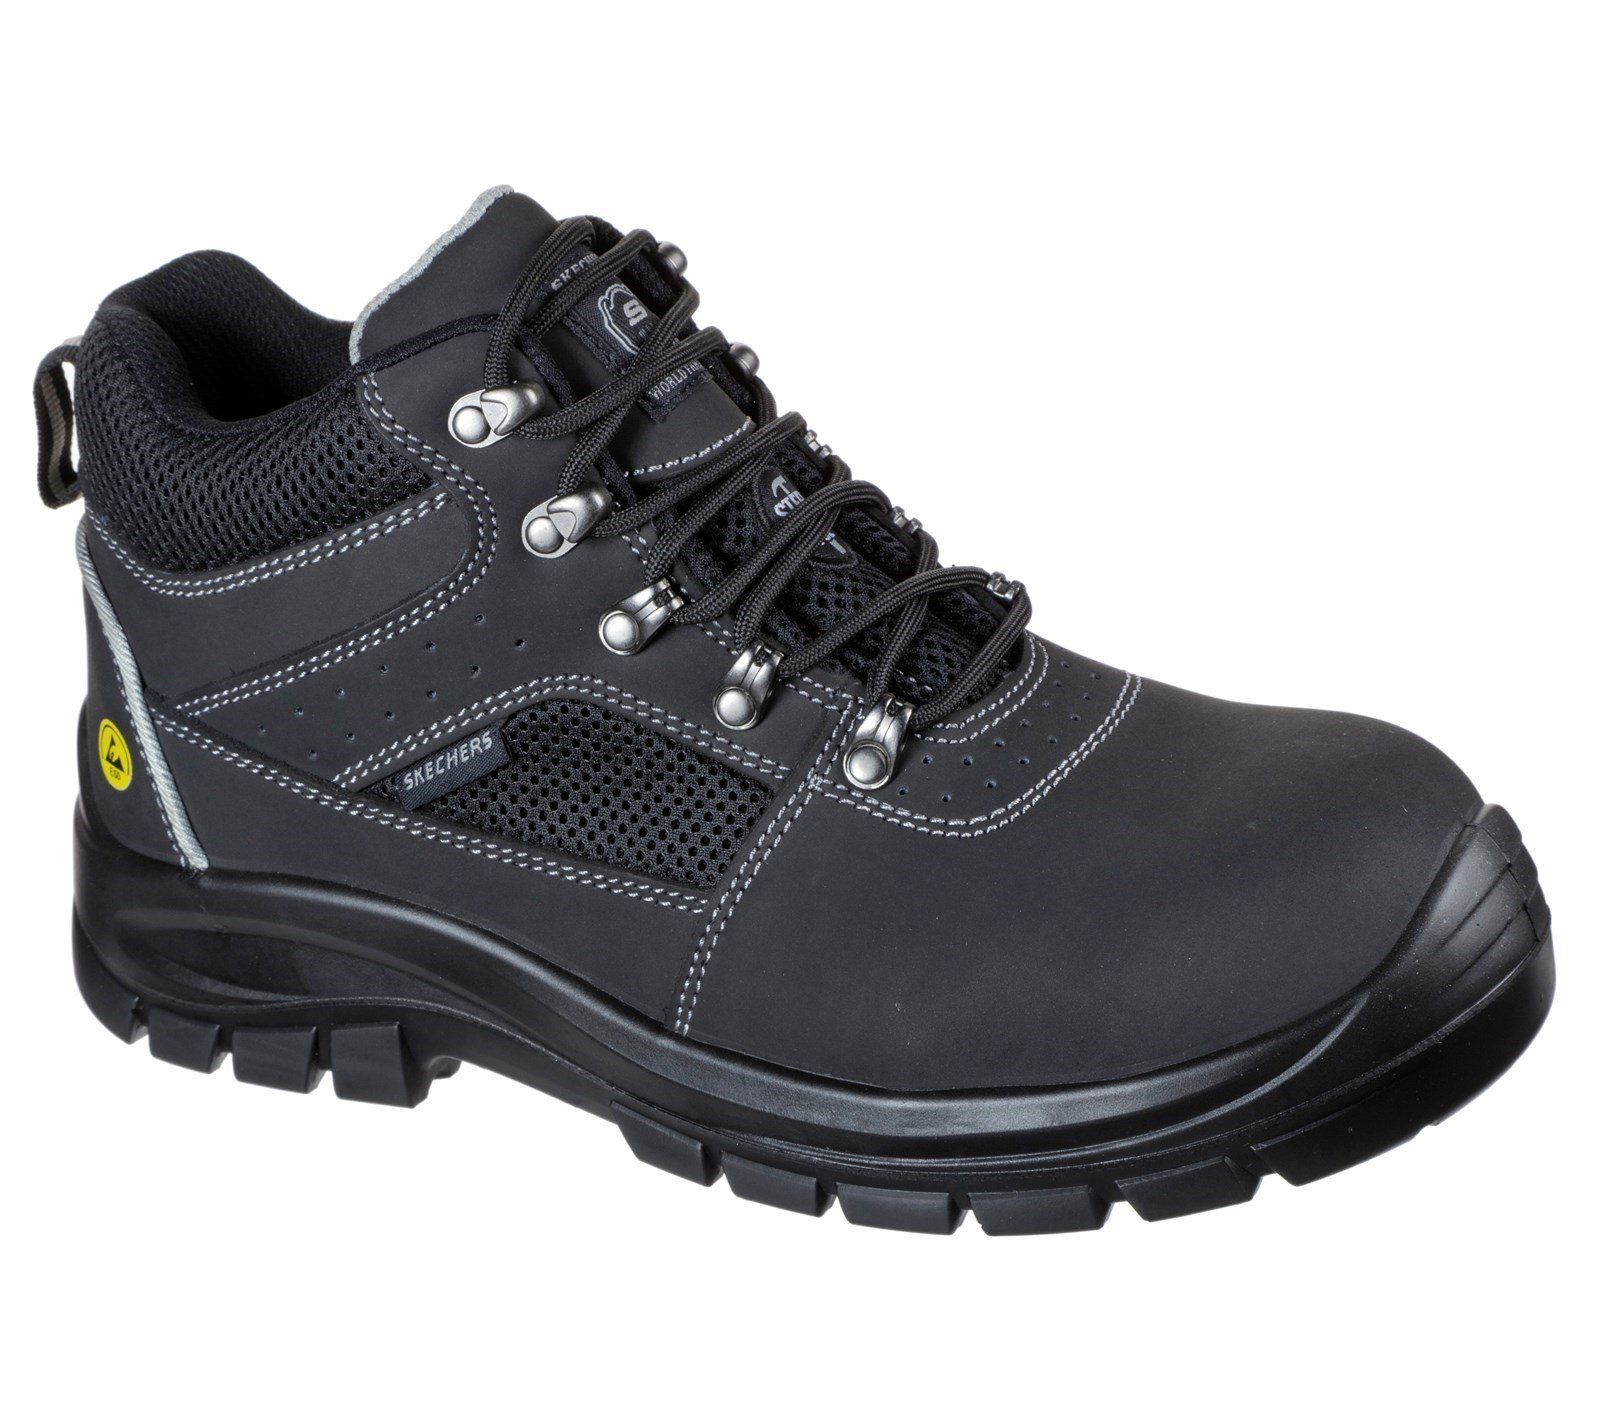 Skechers Unisex Trophus Letic Safety Boot Black 32622 - Black 6